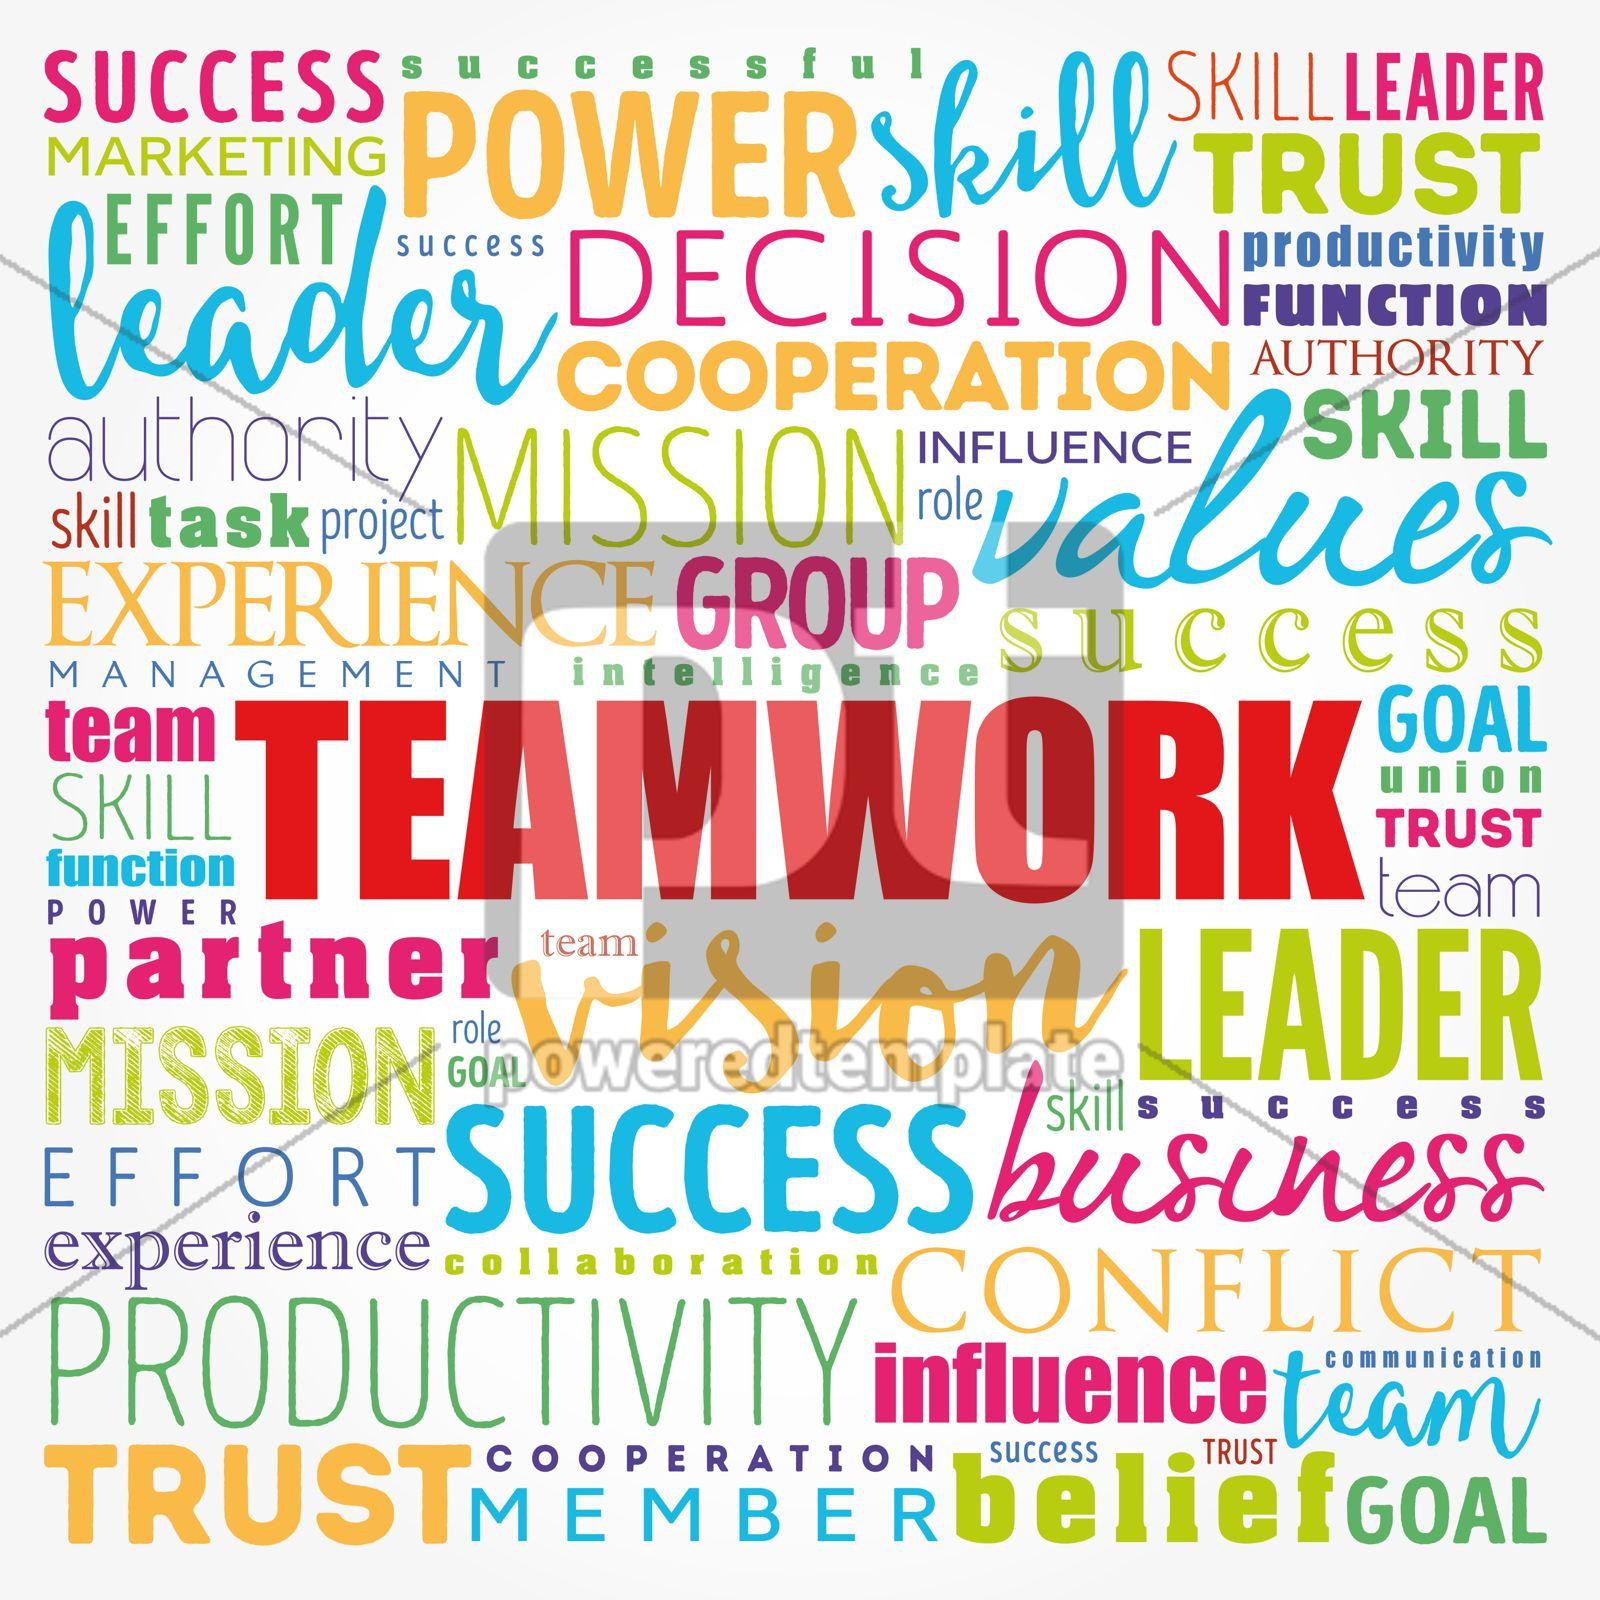 TEAMWORK word cloud collage business concept background, 17185, Business — PoweredTemplate.com